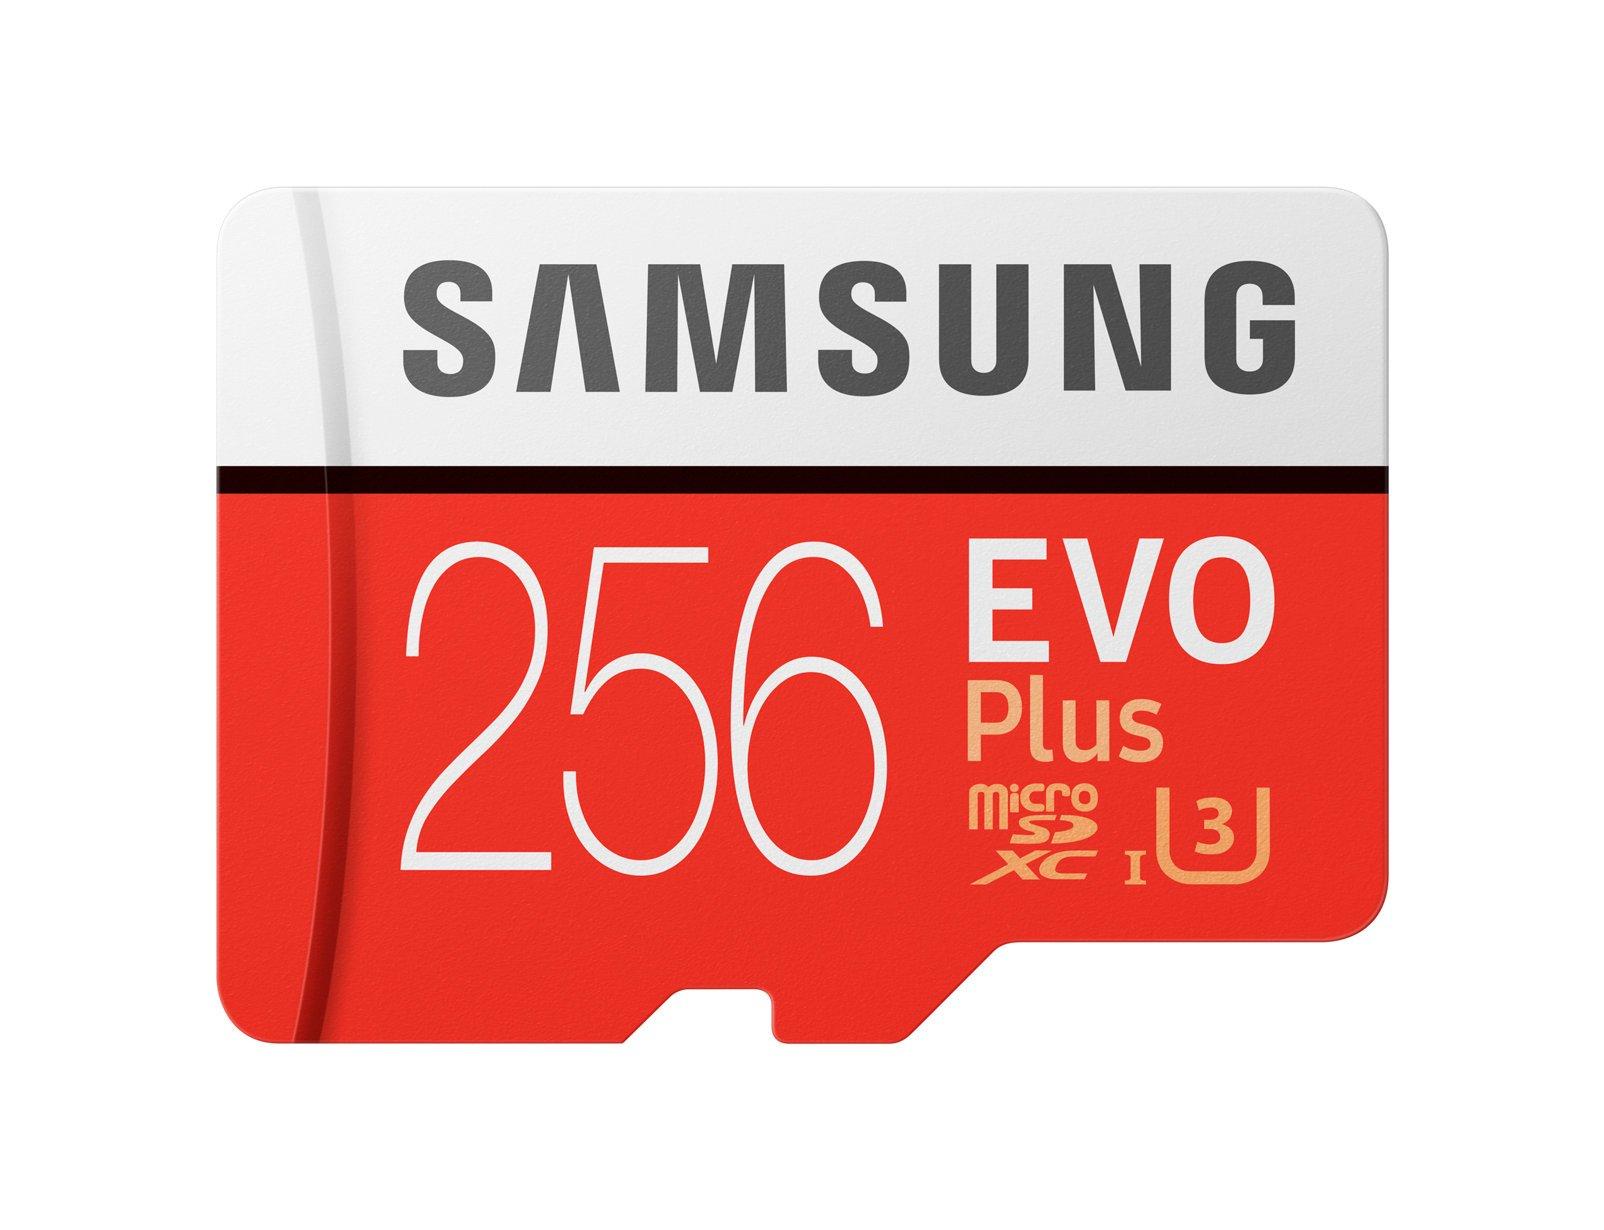 Samsung 256GB EVO Plus Class 10 UHS-I microSDXC U3 with Adapter (MB-MC256GA) by Samsung (Image #4)